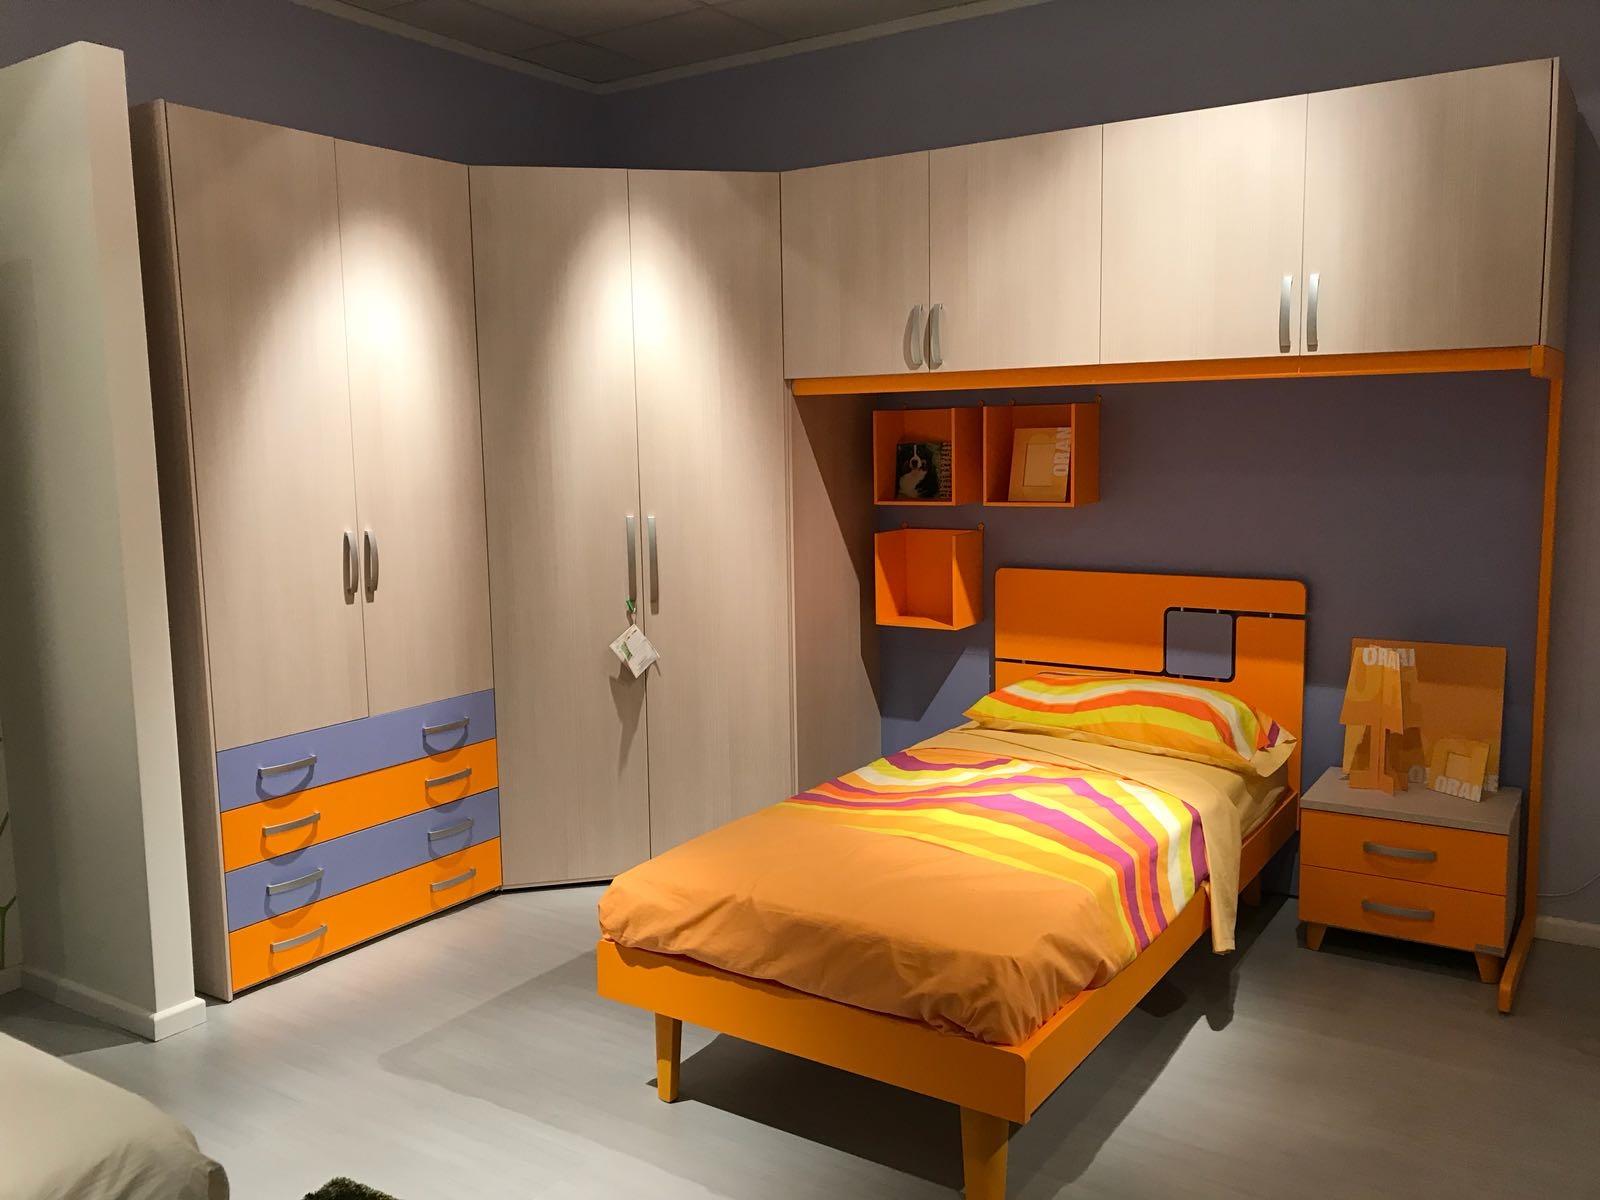 Cameretta ponti kids di moretti compact in offerta outlet for Camerette in offerta